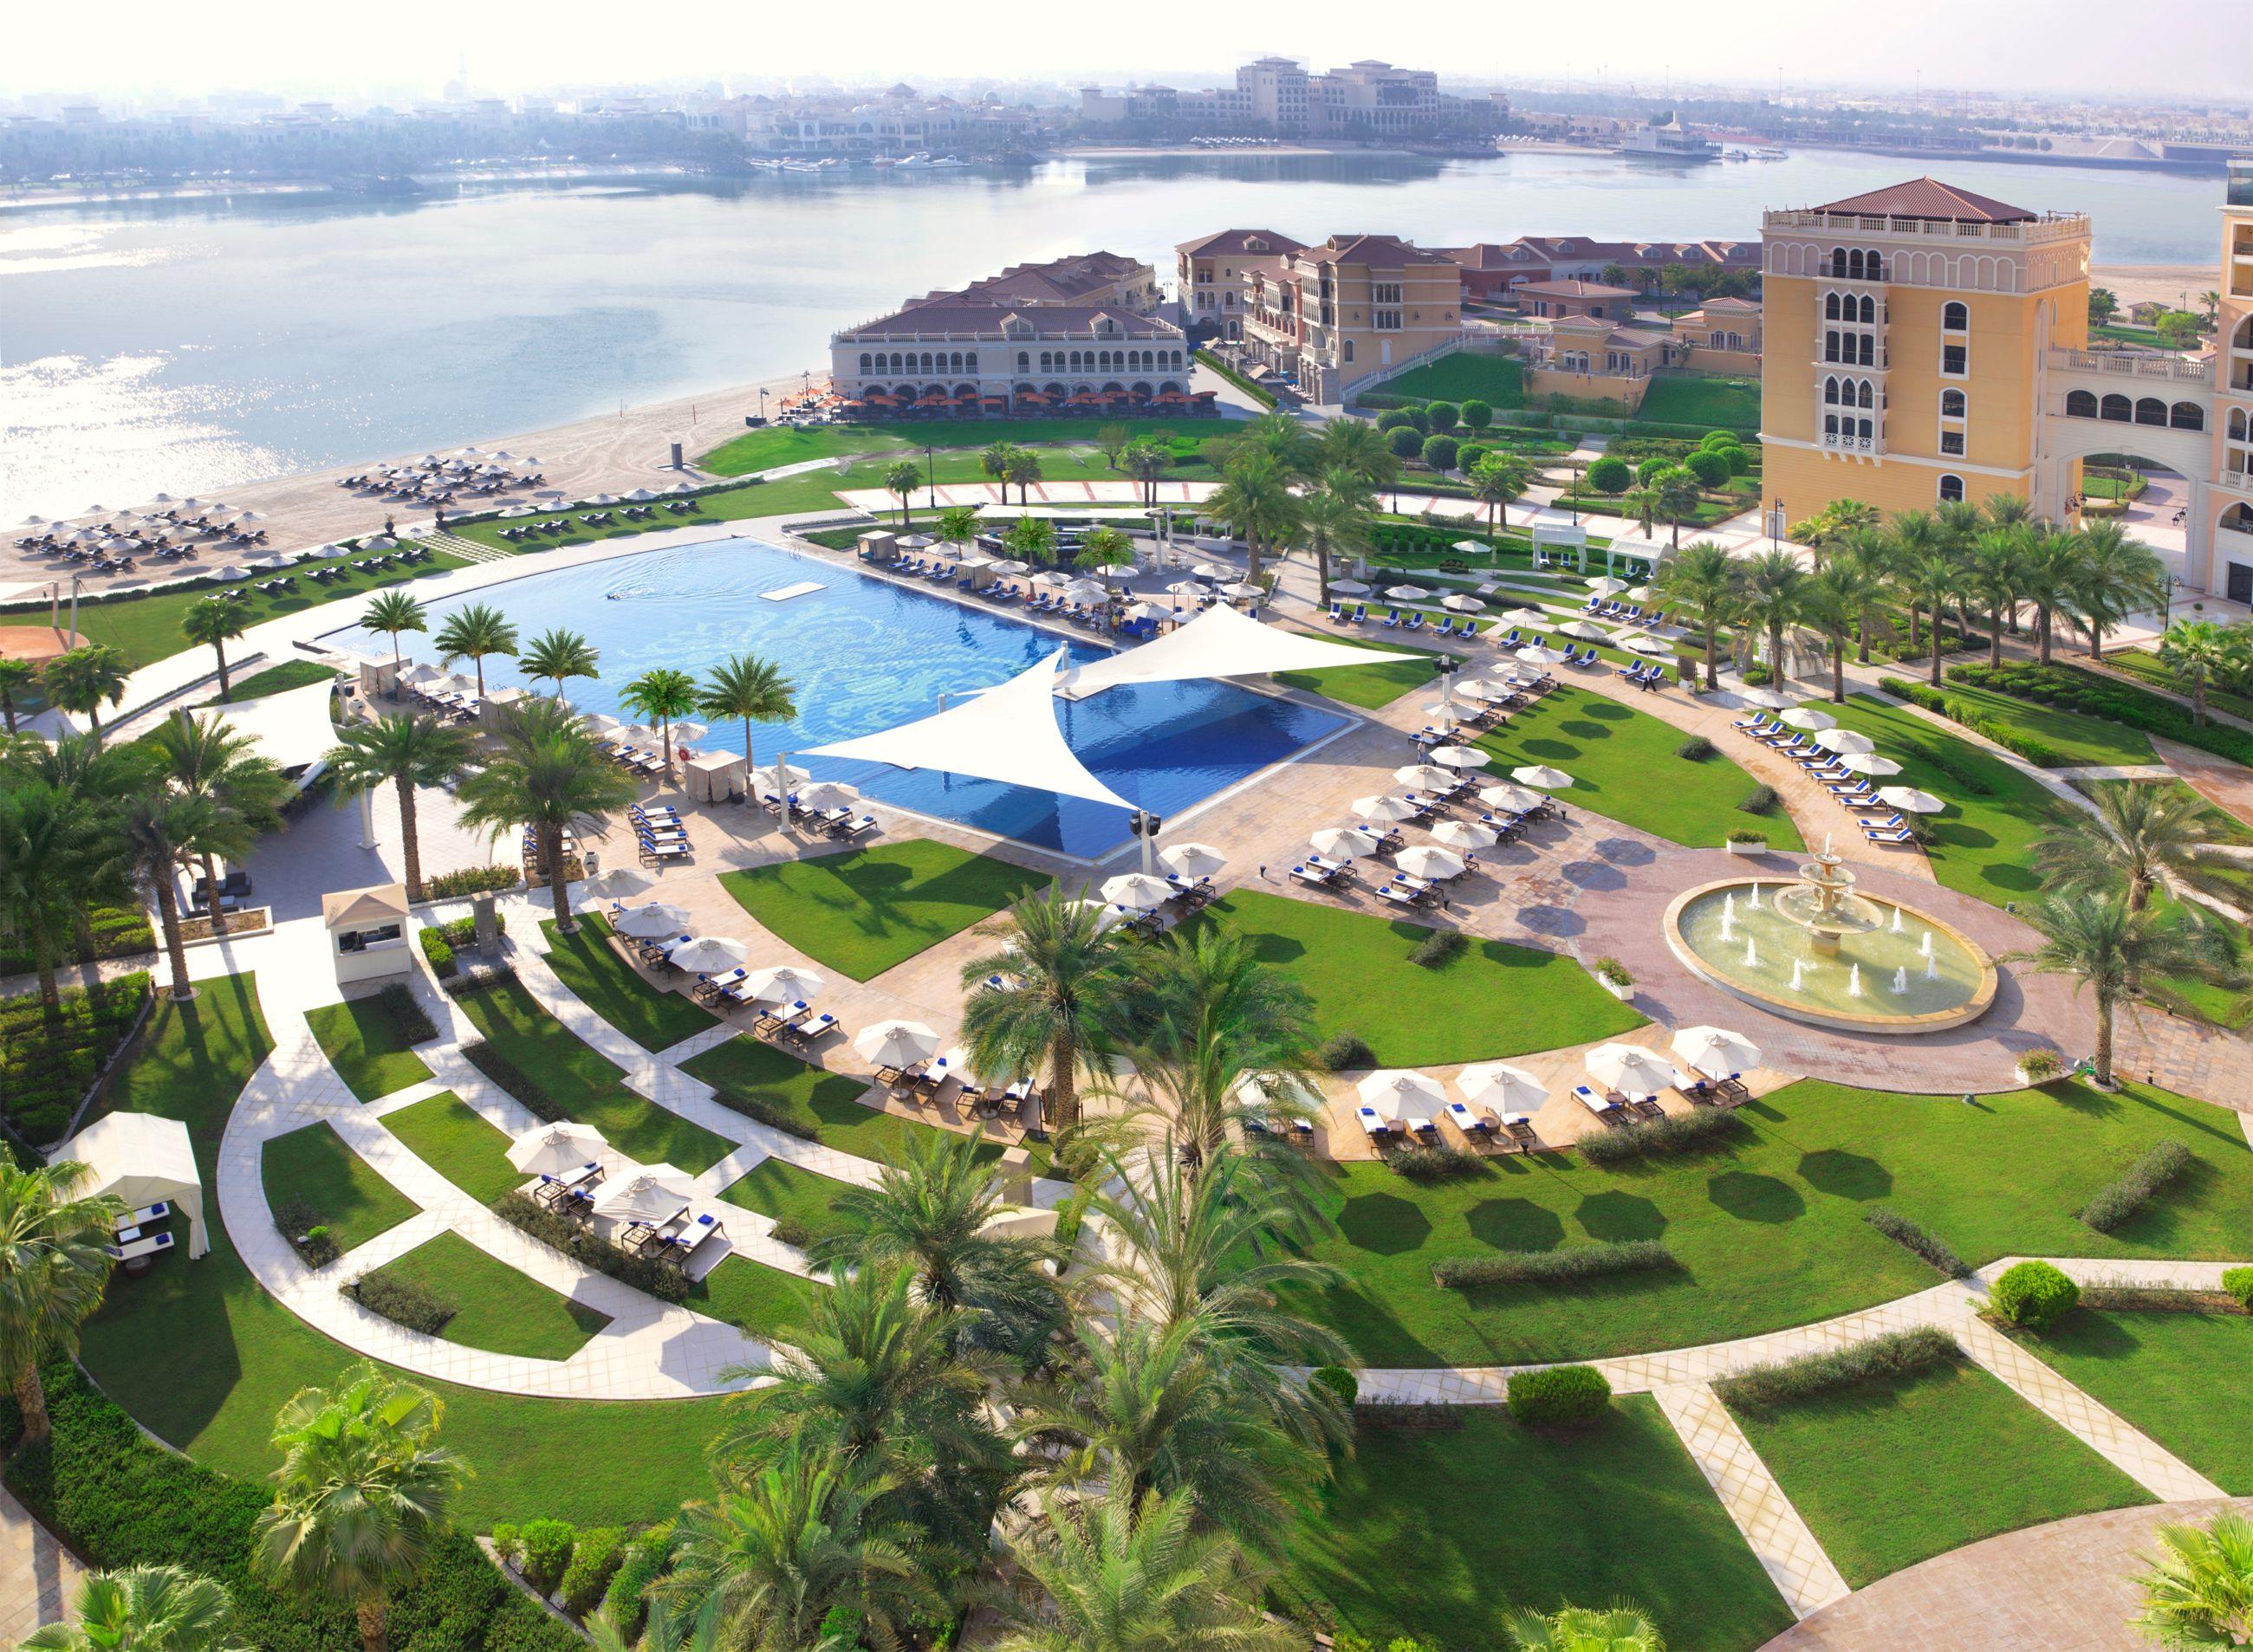 Aerial view of the Ritz-Carlton Abu Dhabi resort